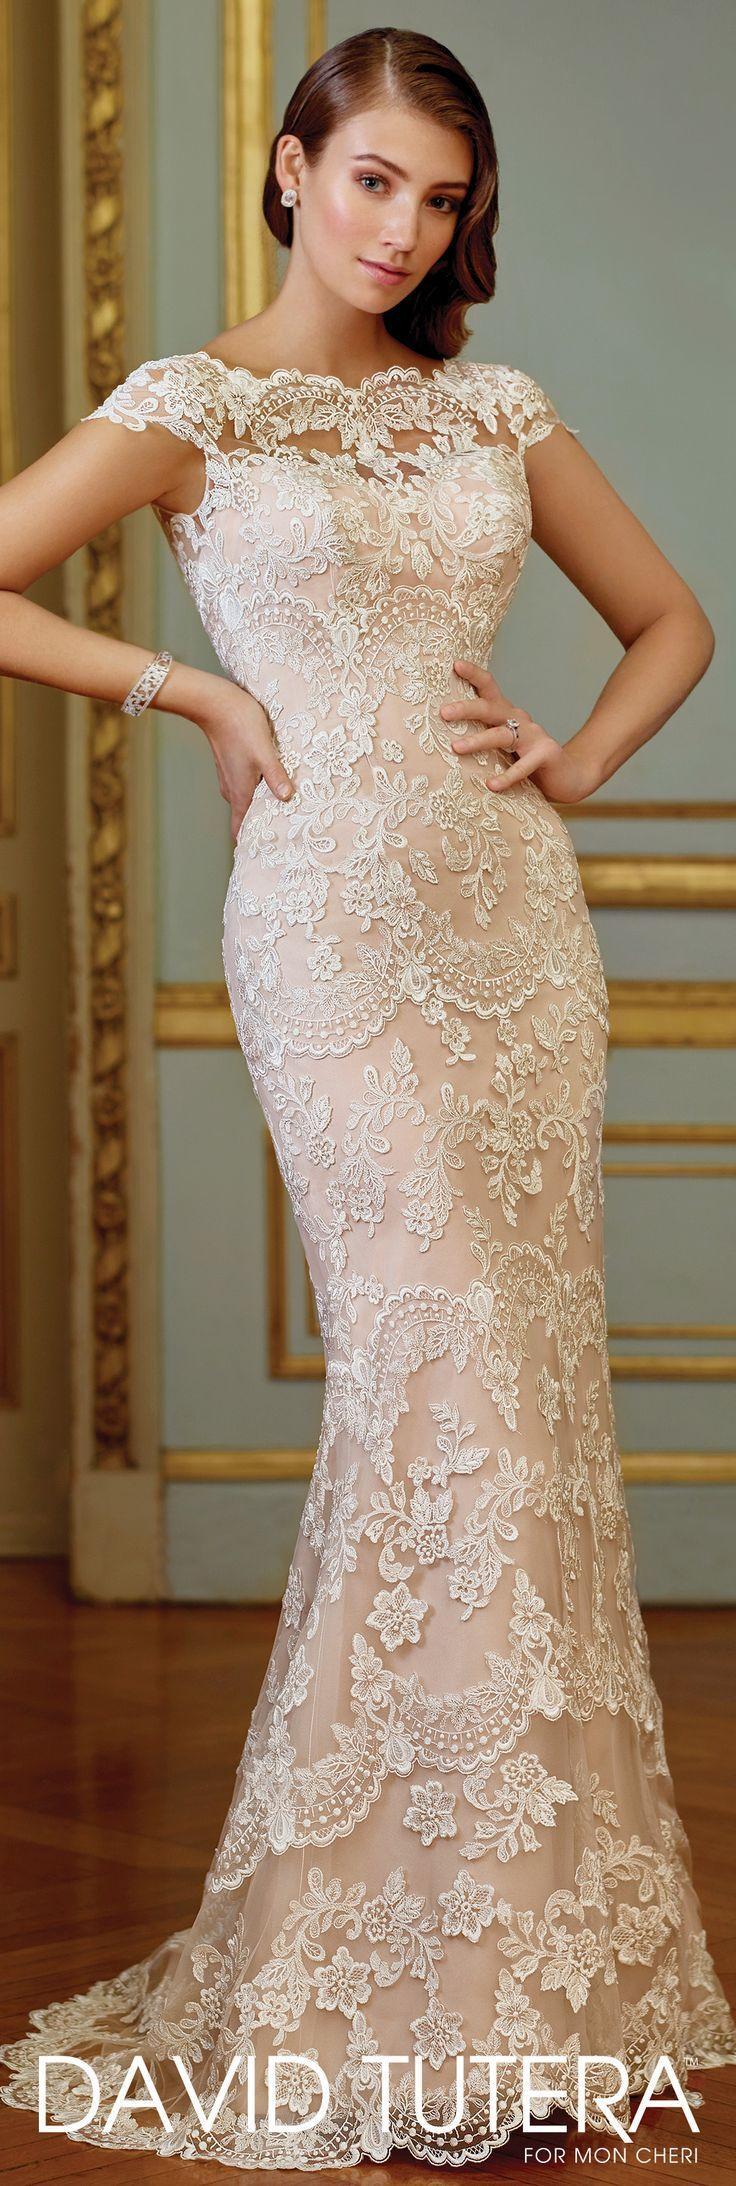 Champagne and ivory wedding dress  Liliana Segura lsegura on Pinterest